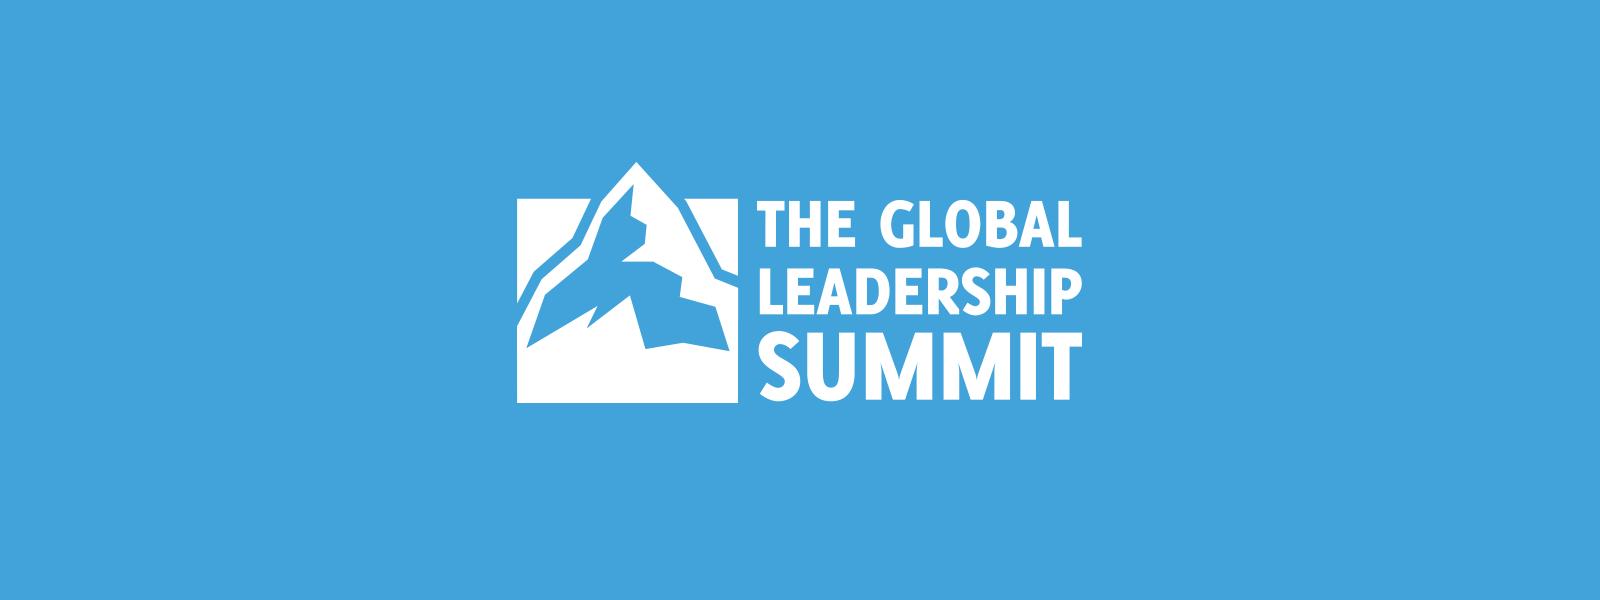 GlobalLeadershipSummit__1600x600-EventHero